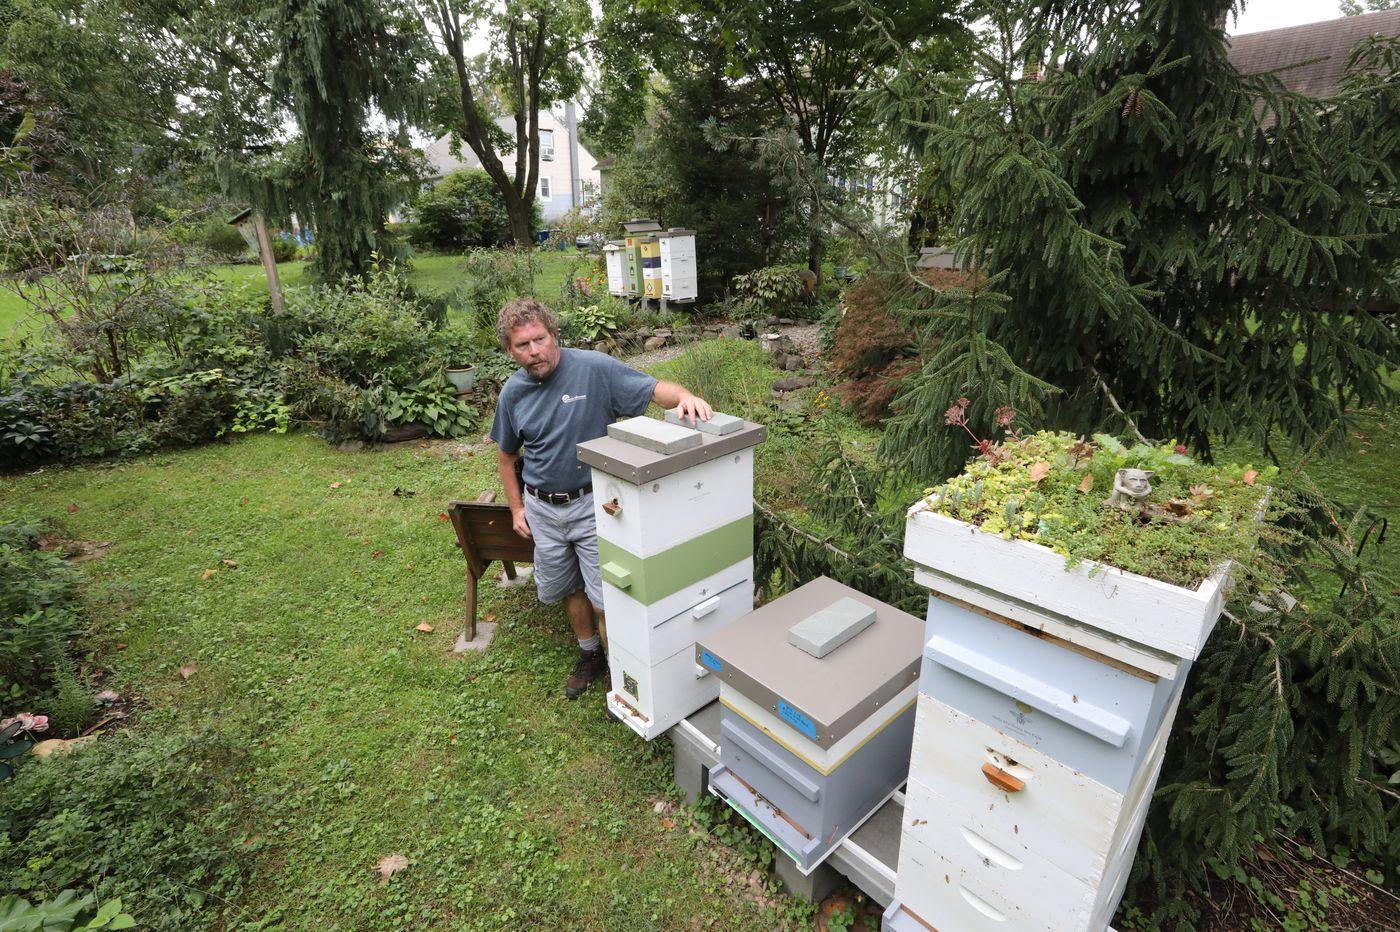 Hatfield delays decision on backyard bees